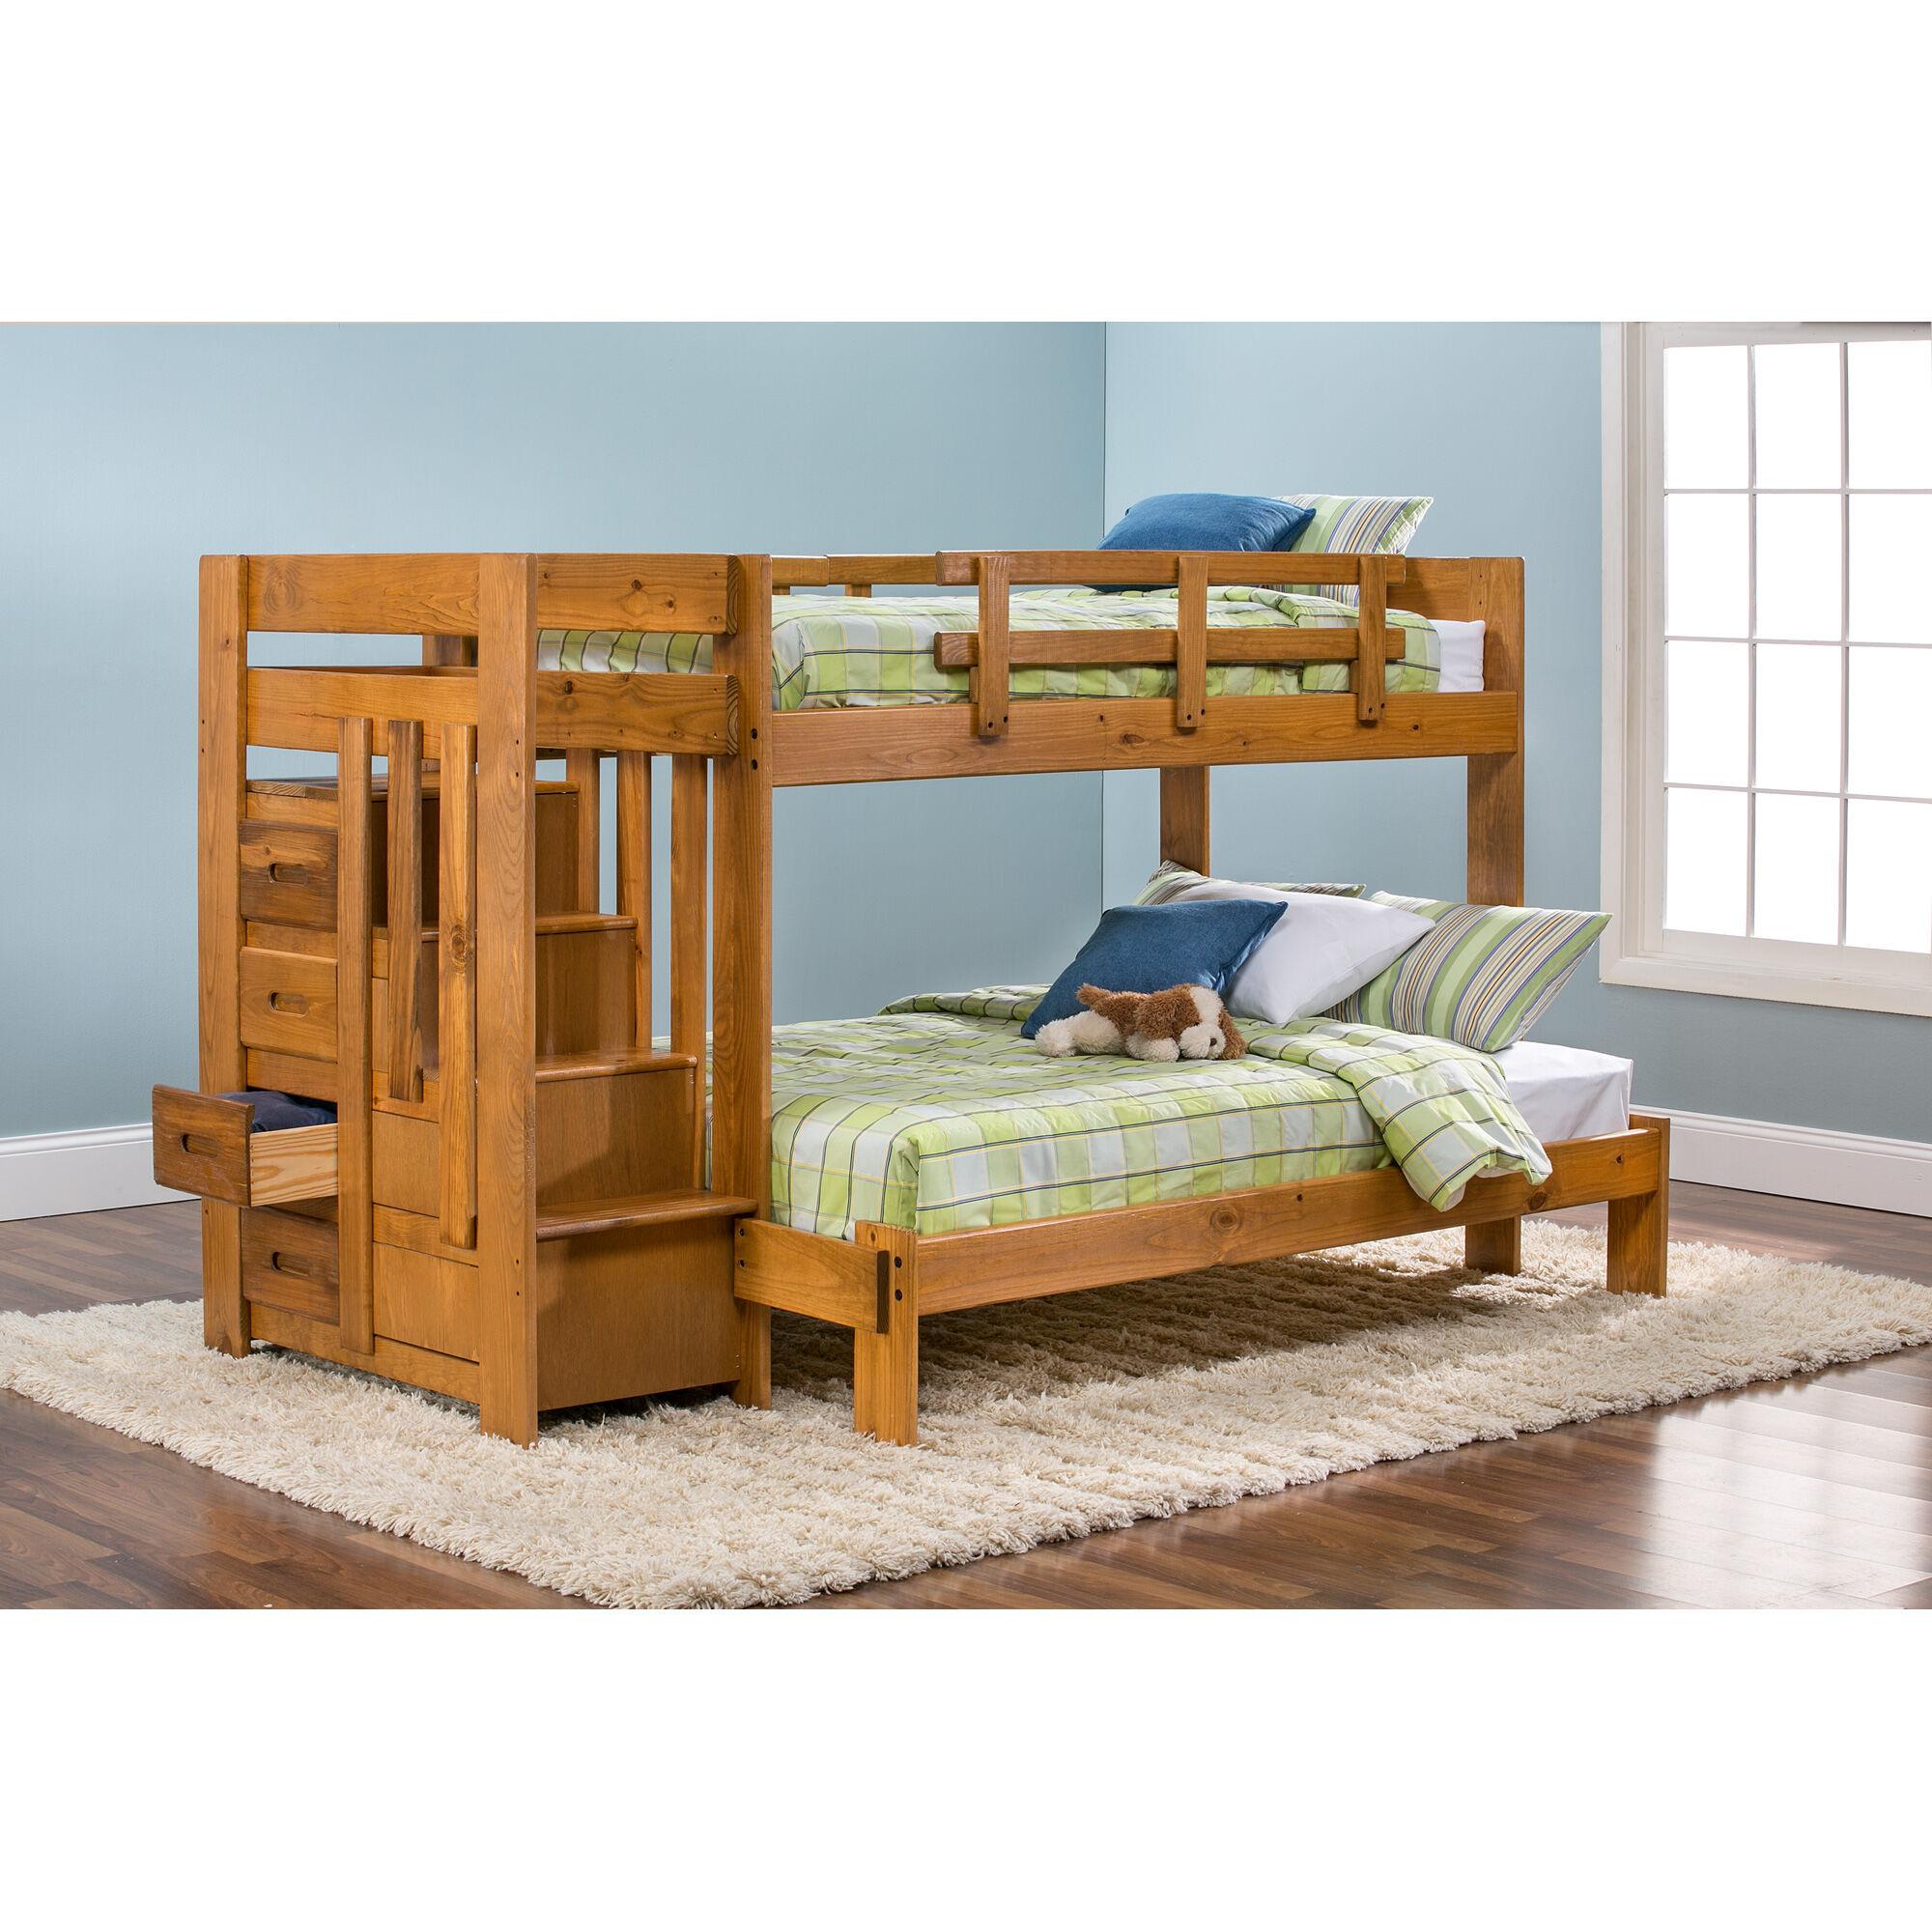 slumberland furniture tanglewood honey tw fl stair bunk on Slumberland Bunk Beds id=90860